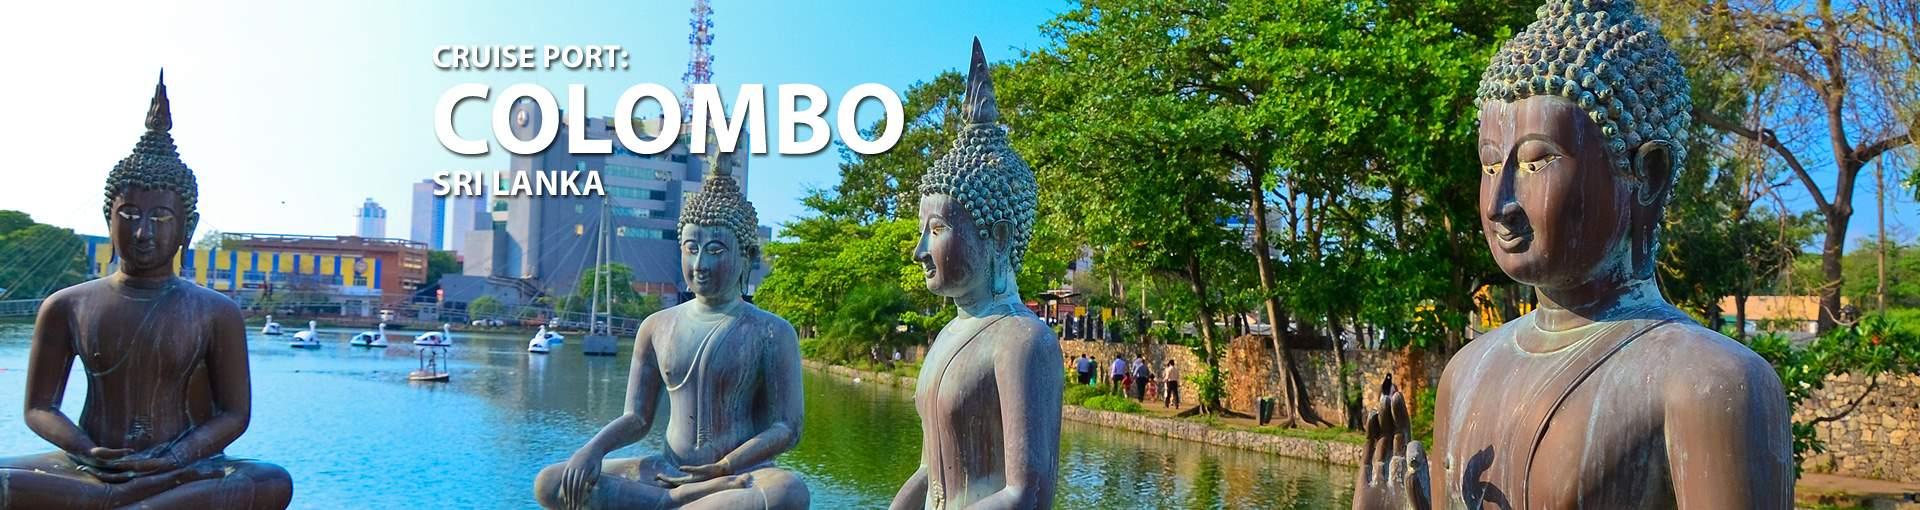 Cruises to Colombo, Sri Lanka